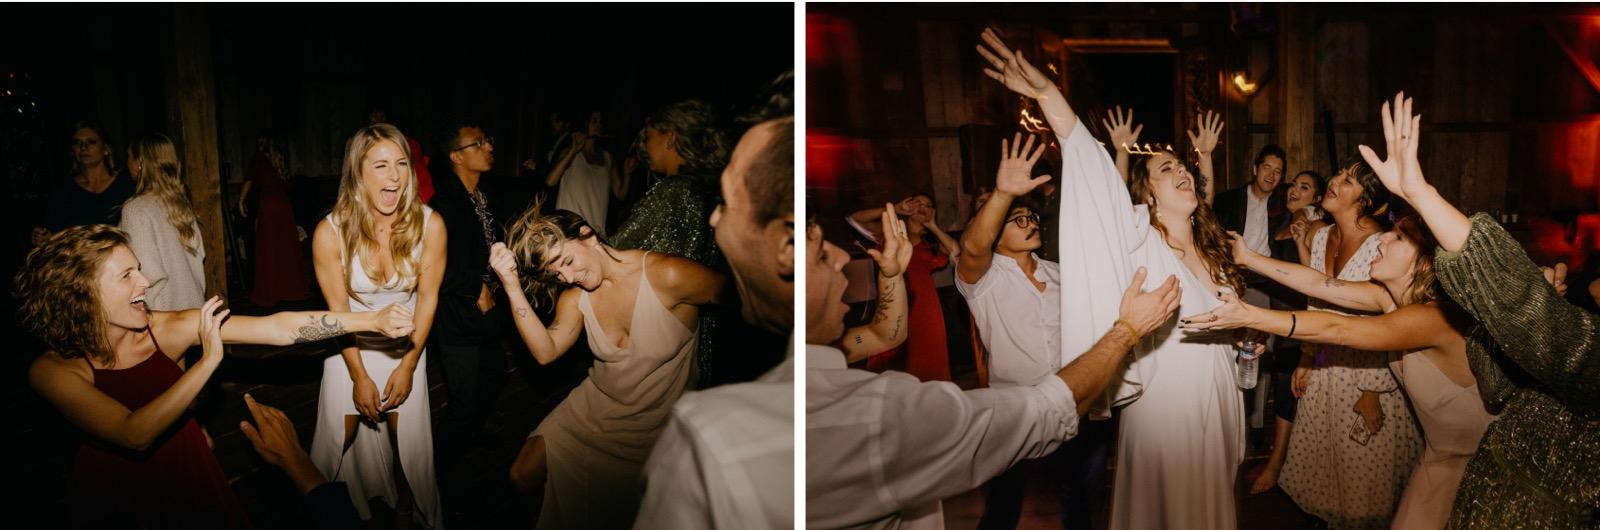 135_Emily & Jeff Wedding 1231_Emily & Jeff Wedding 1179_the-waterfall-lodge_forest_wedding_ben-lomond_intimate